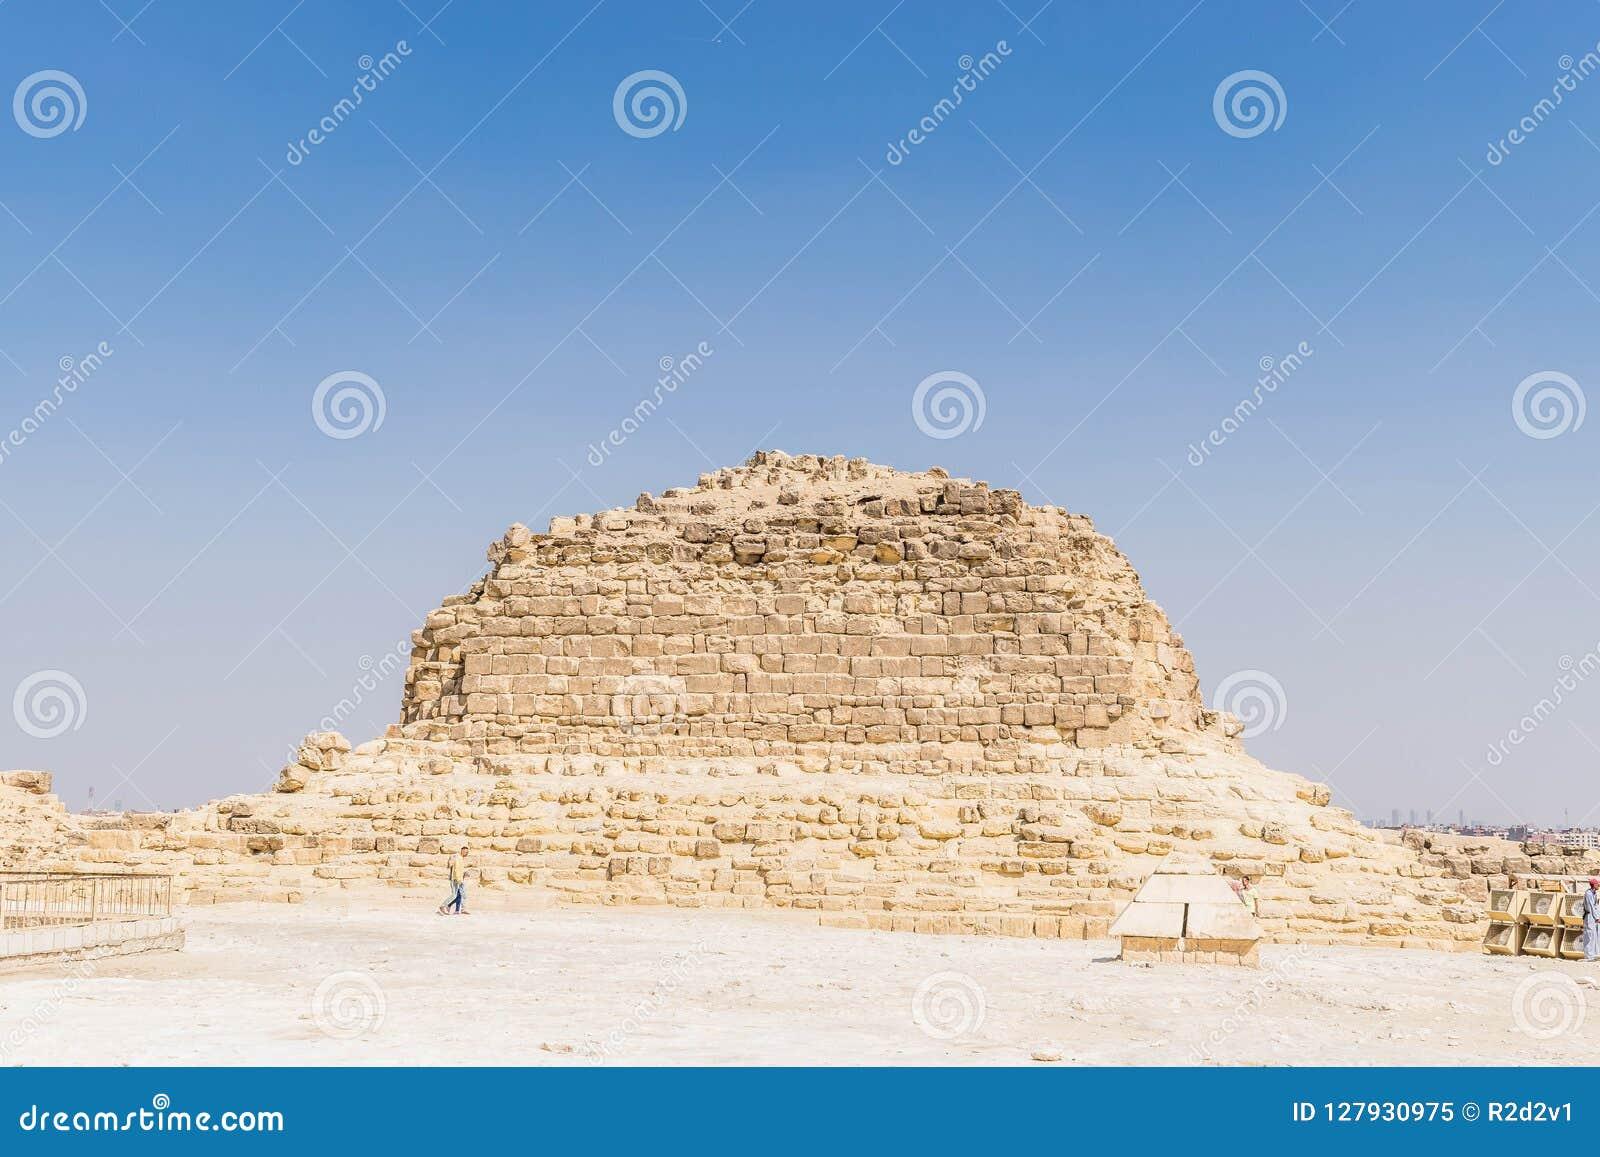 Pirâmide G1-c em Giza, Egito